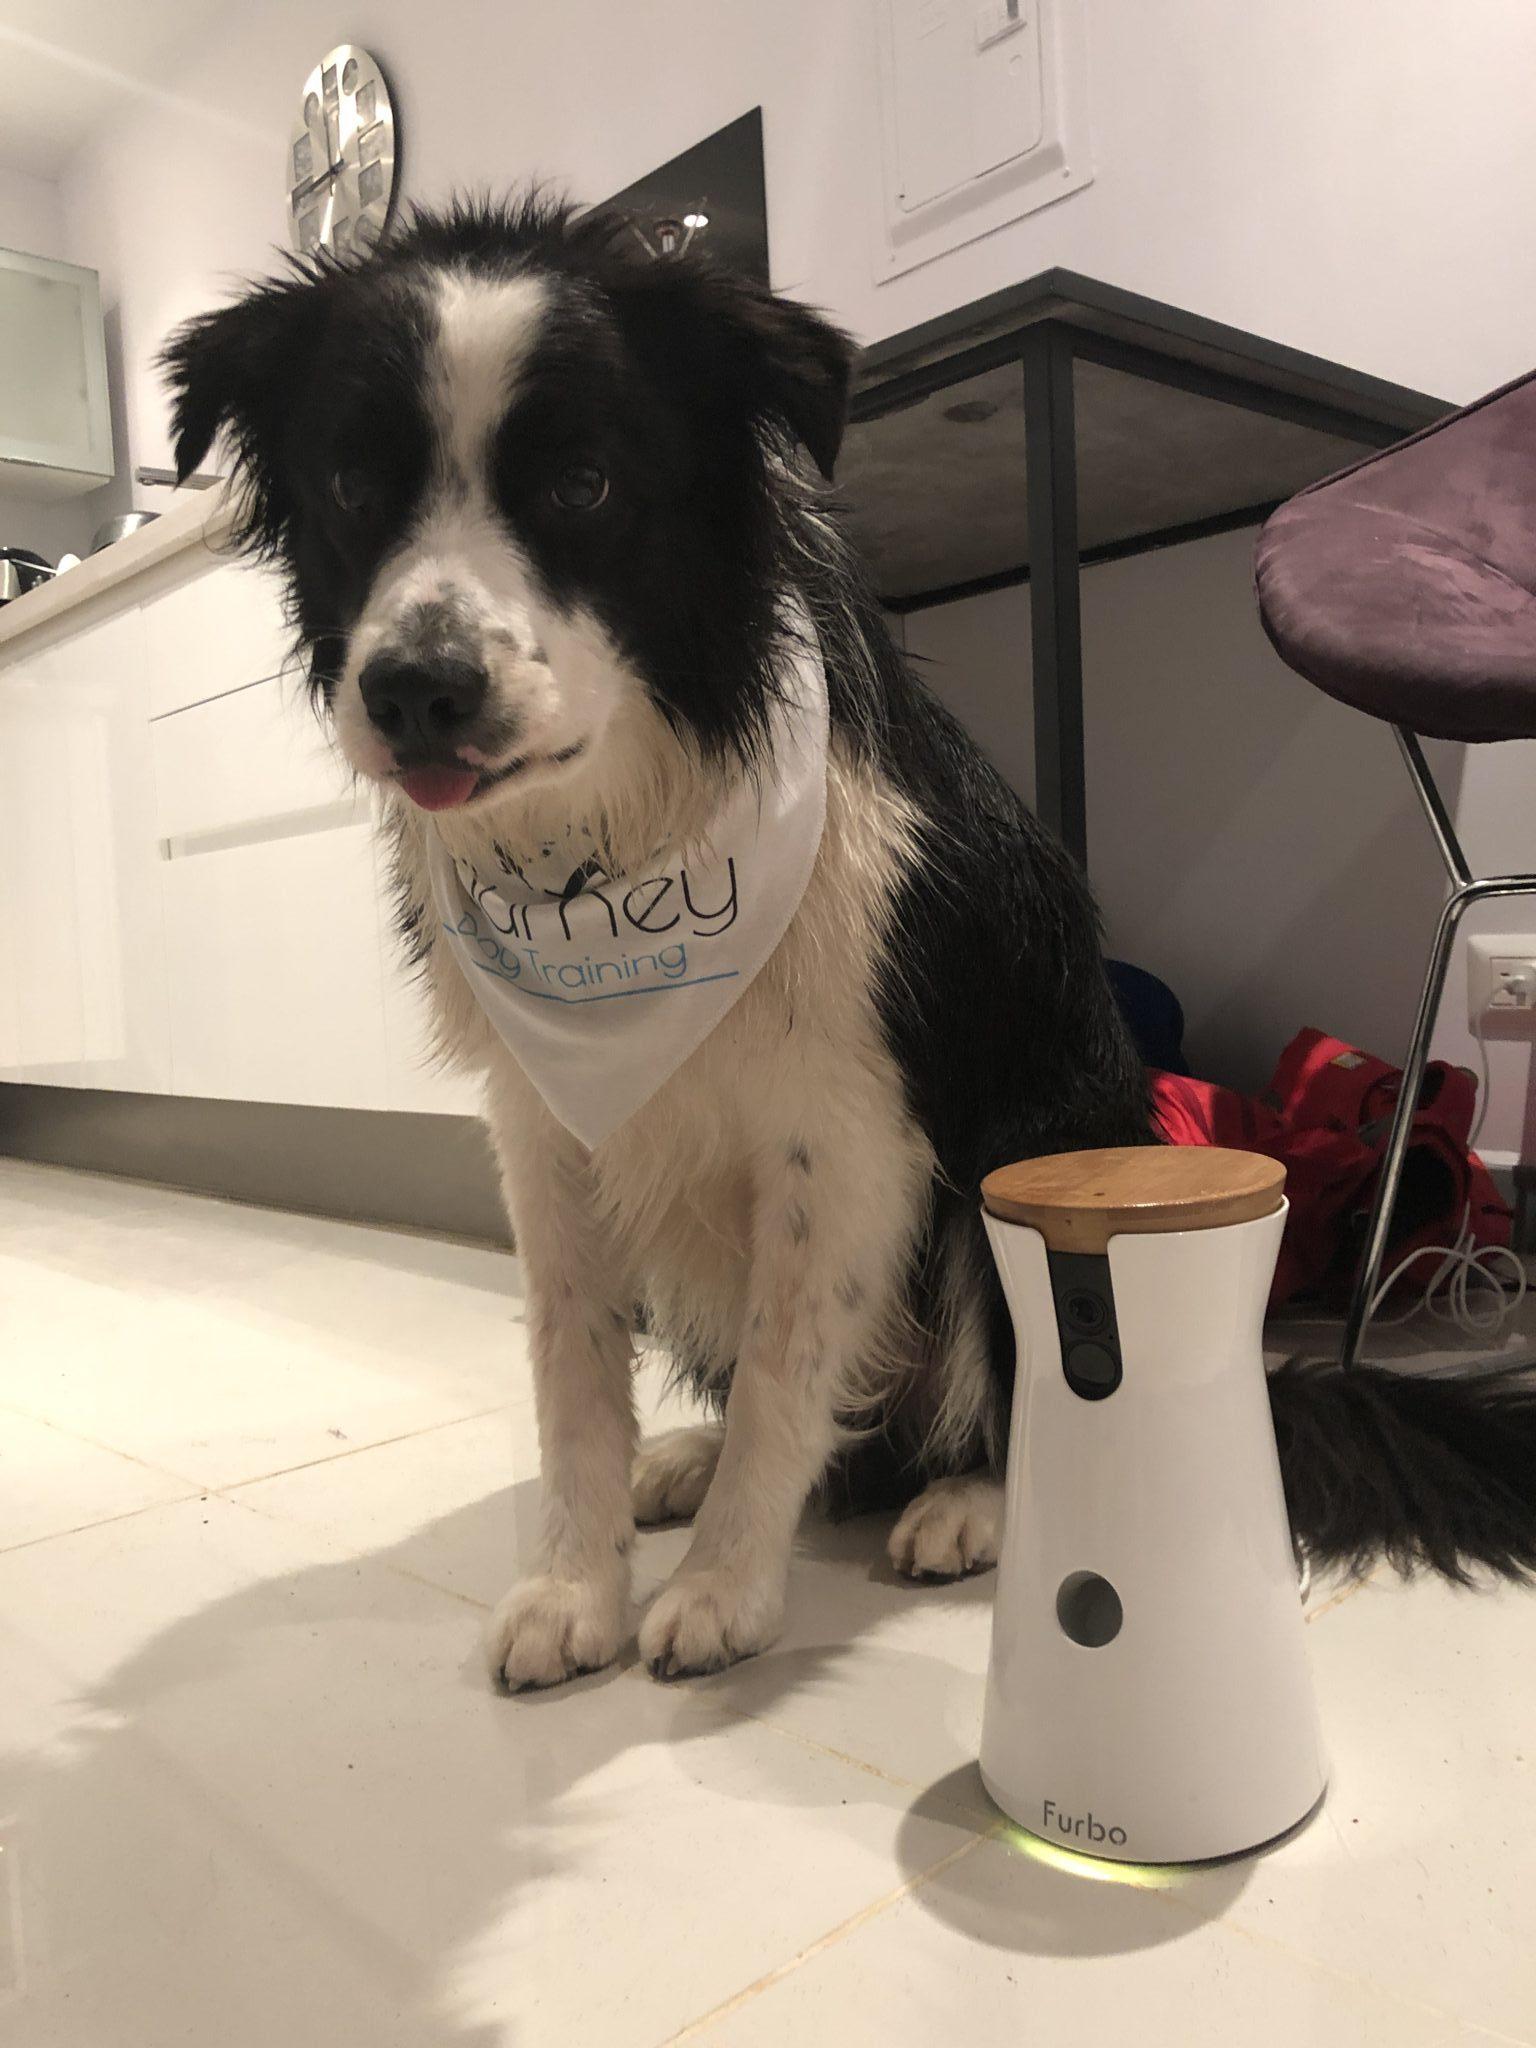 furbo journey dog training